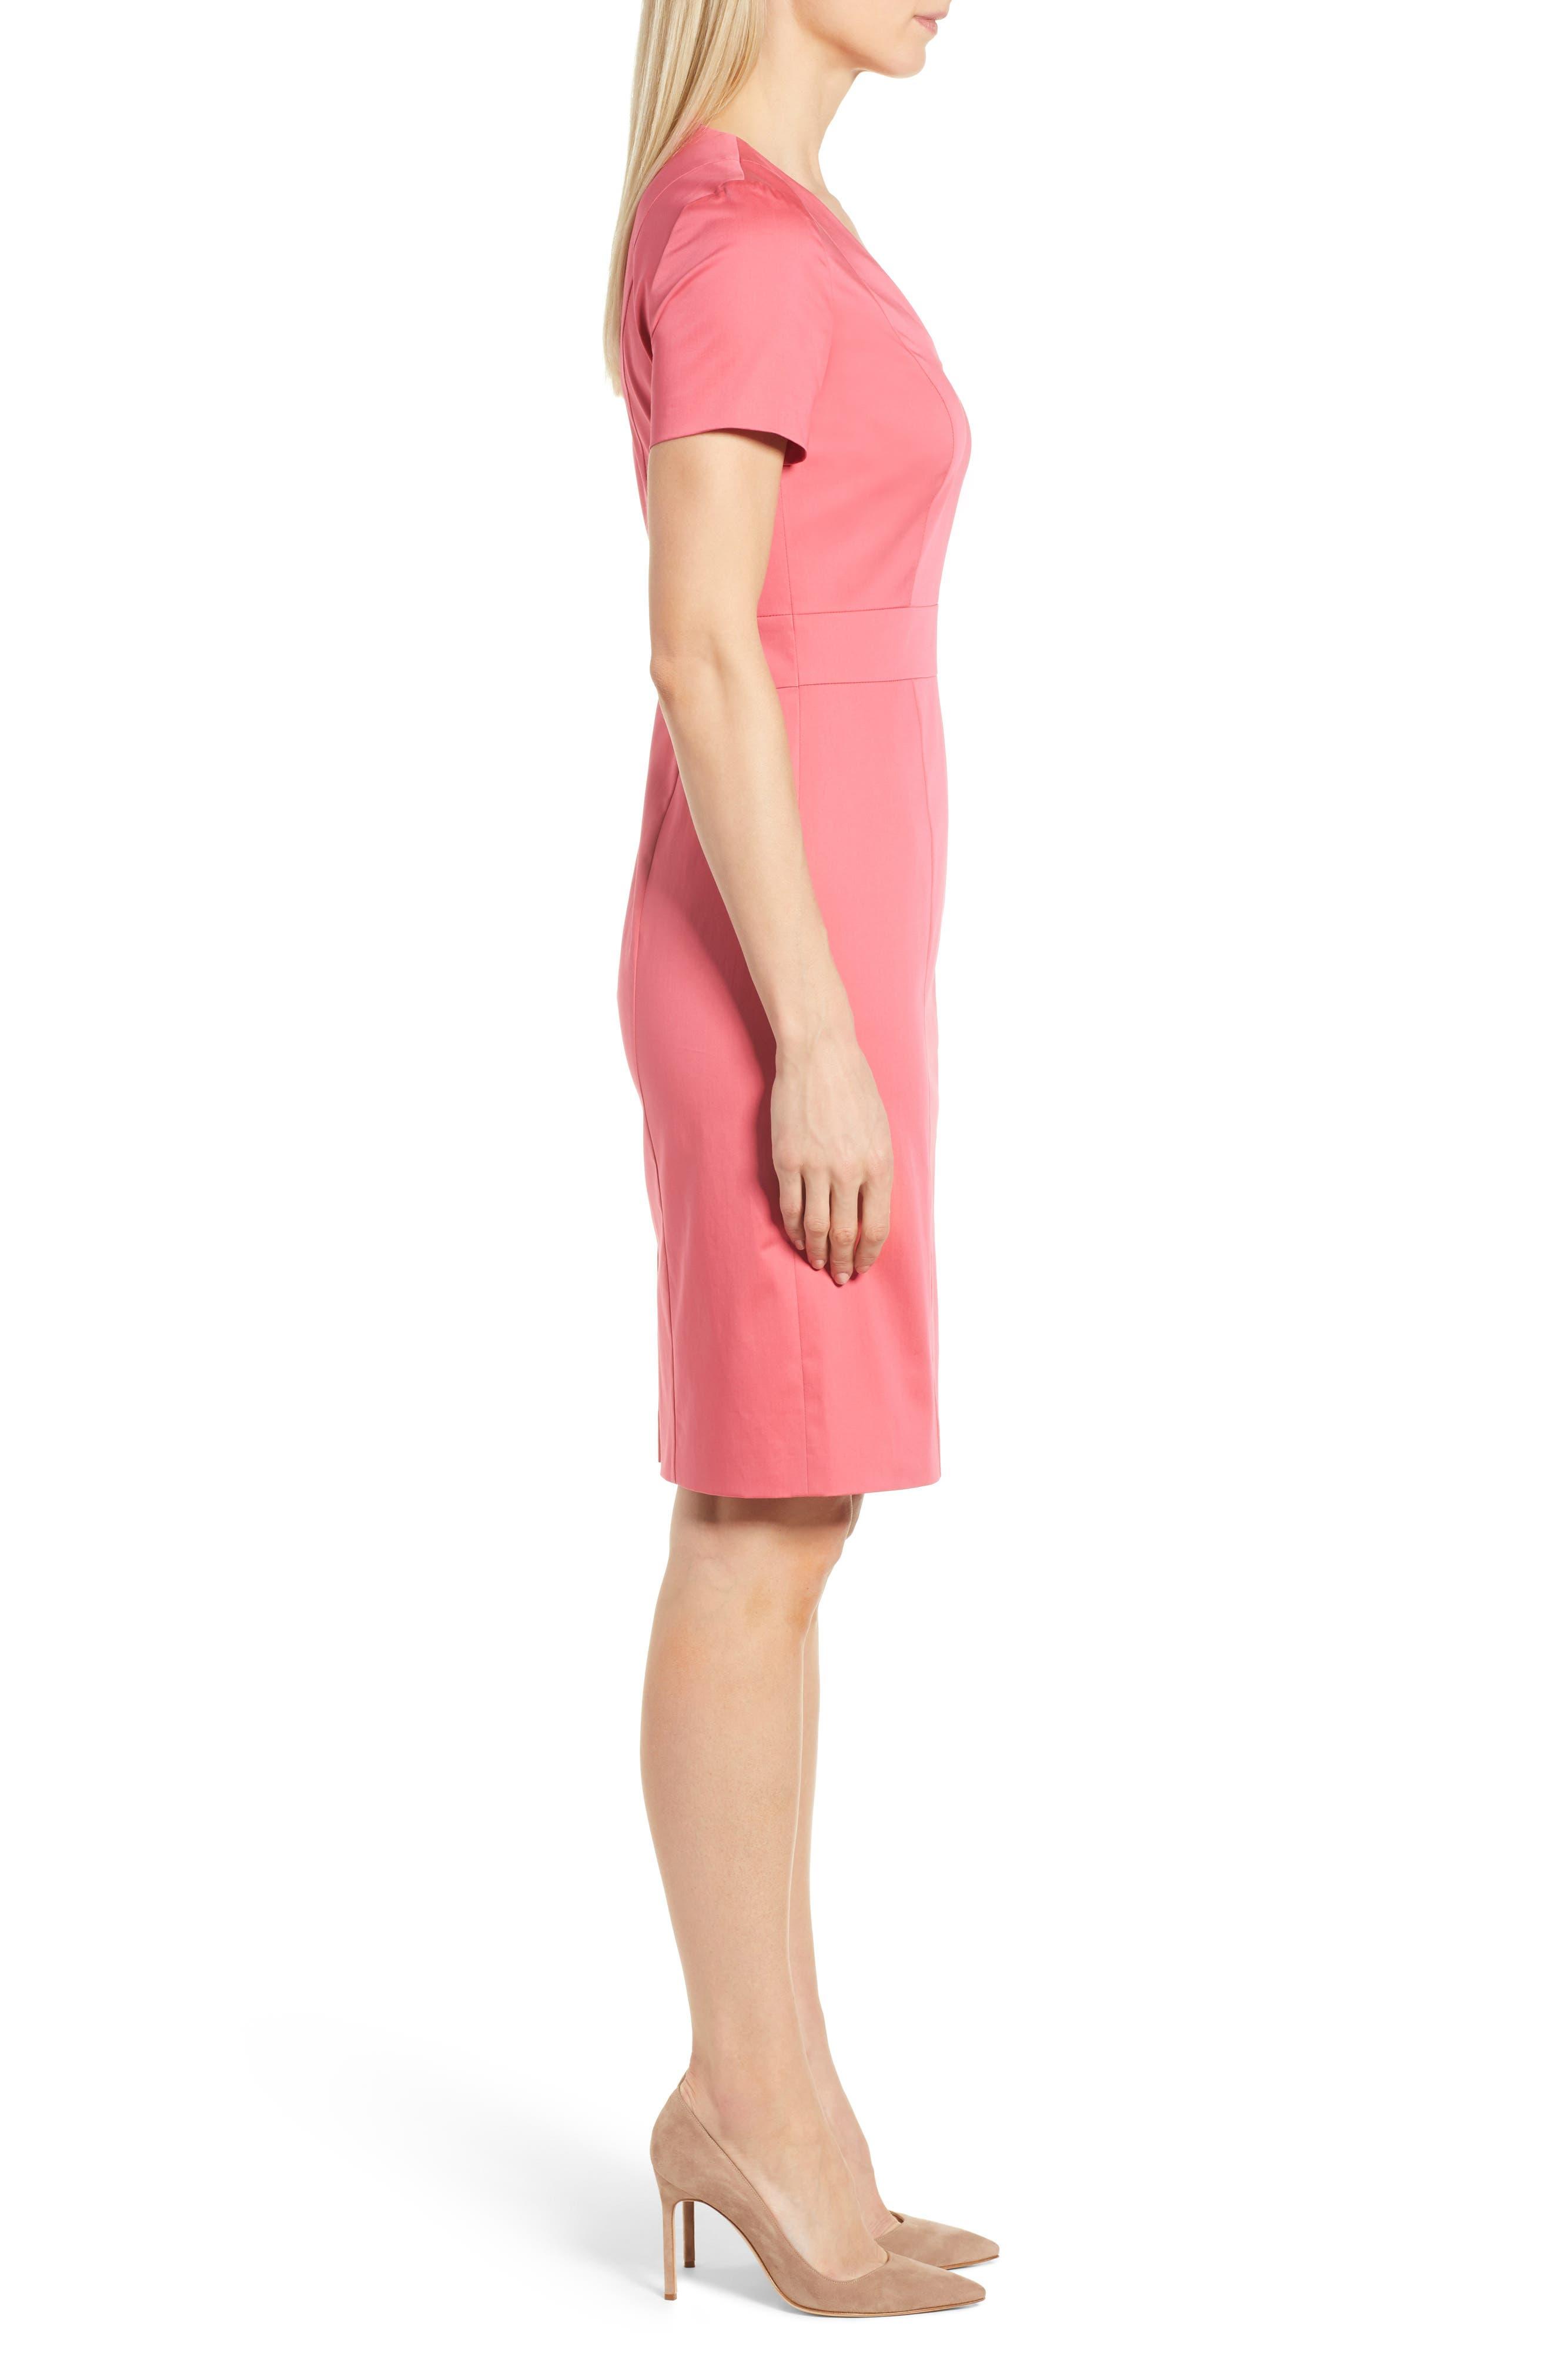 Dasali V-Neck Sheath Dress,                             Alternate thumbnail 3, color,                             Lychee Pink